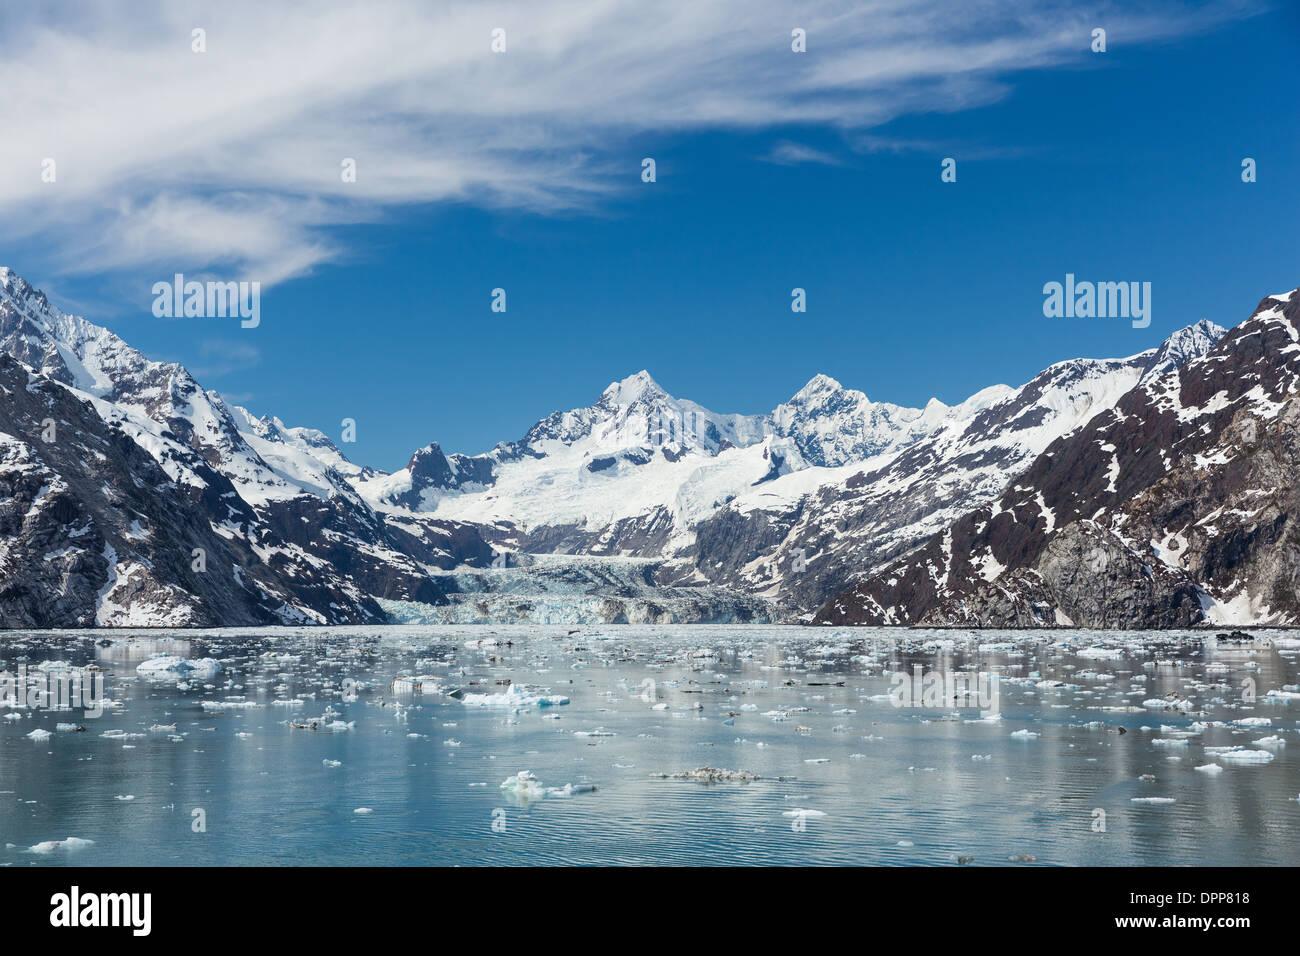 Entrada de Johns Hopkins, Glacier Bay, Alaska. Imagen De Stock